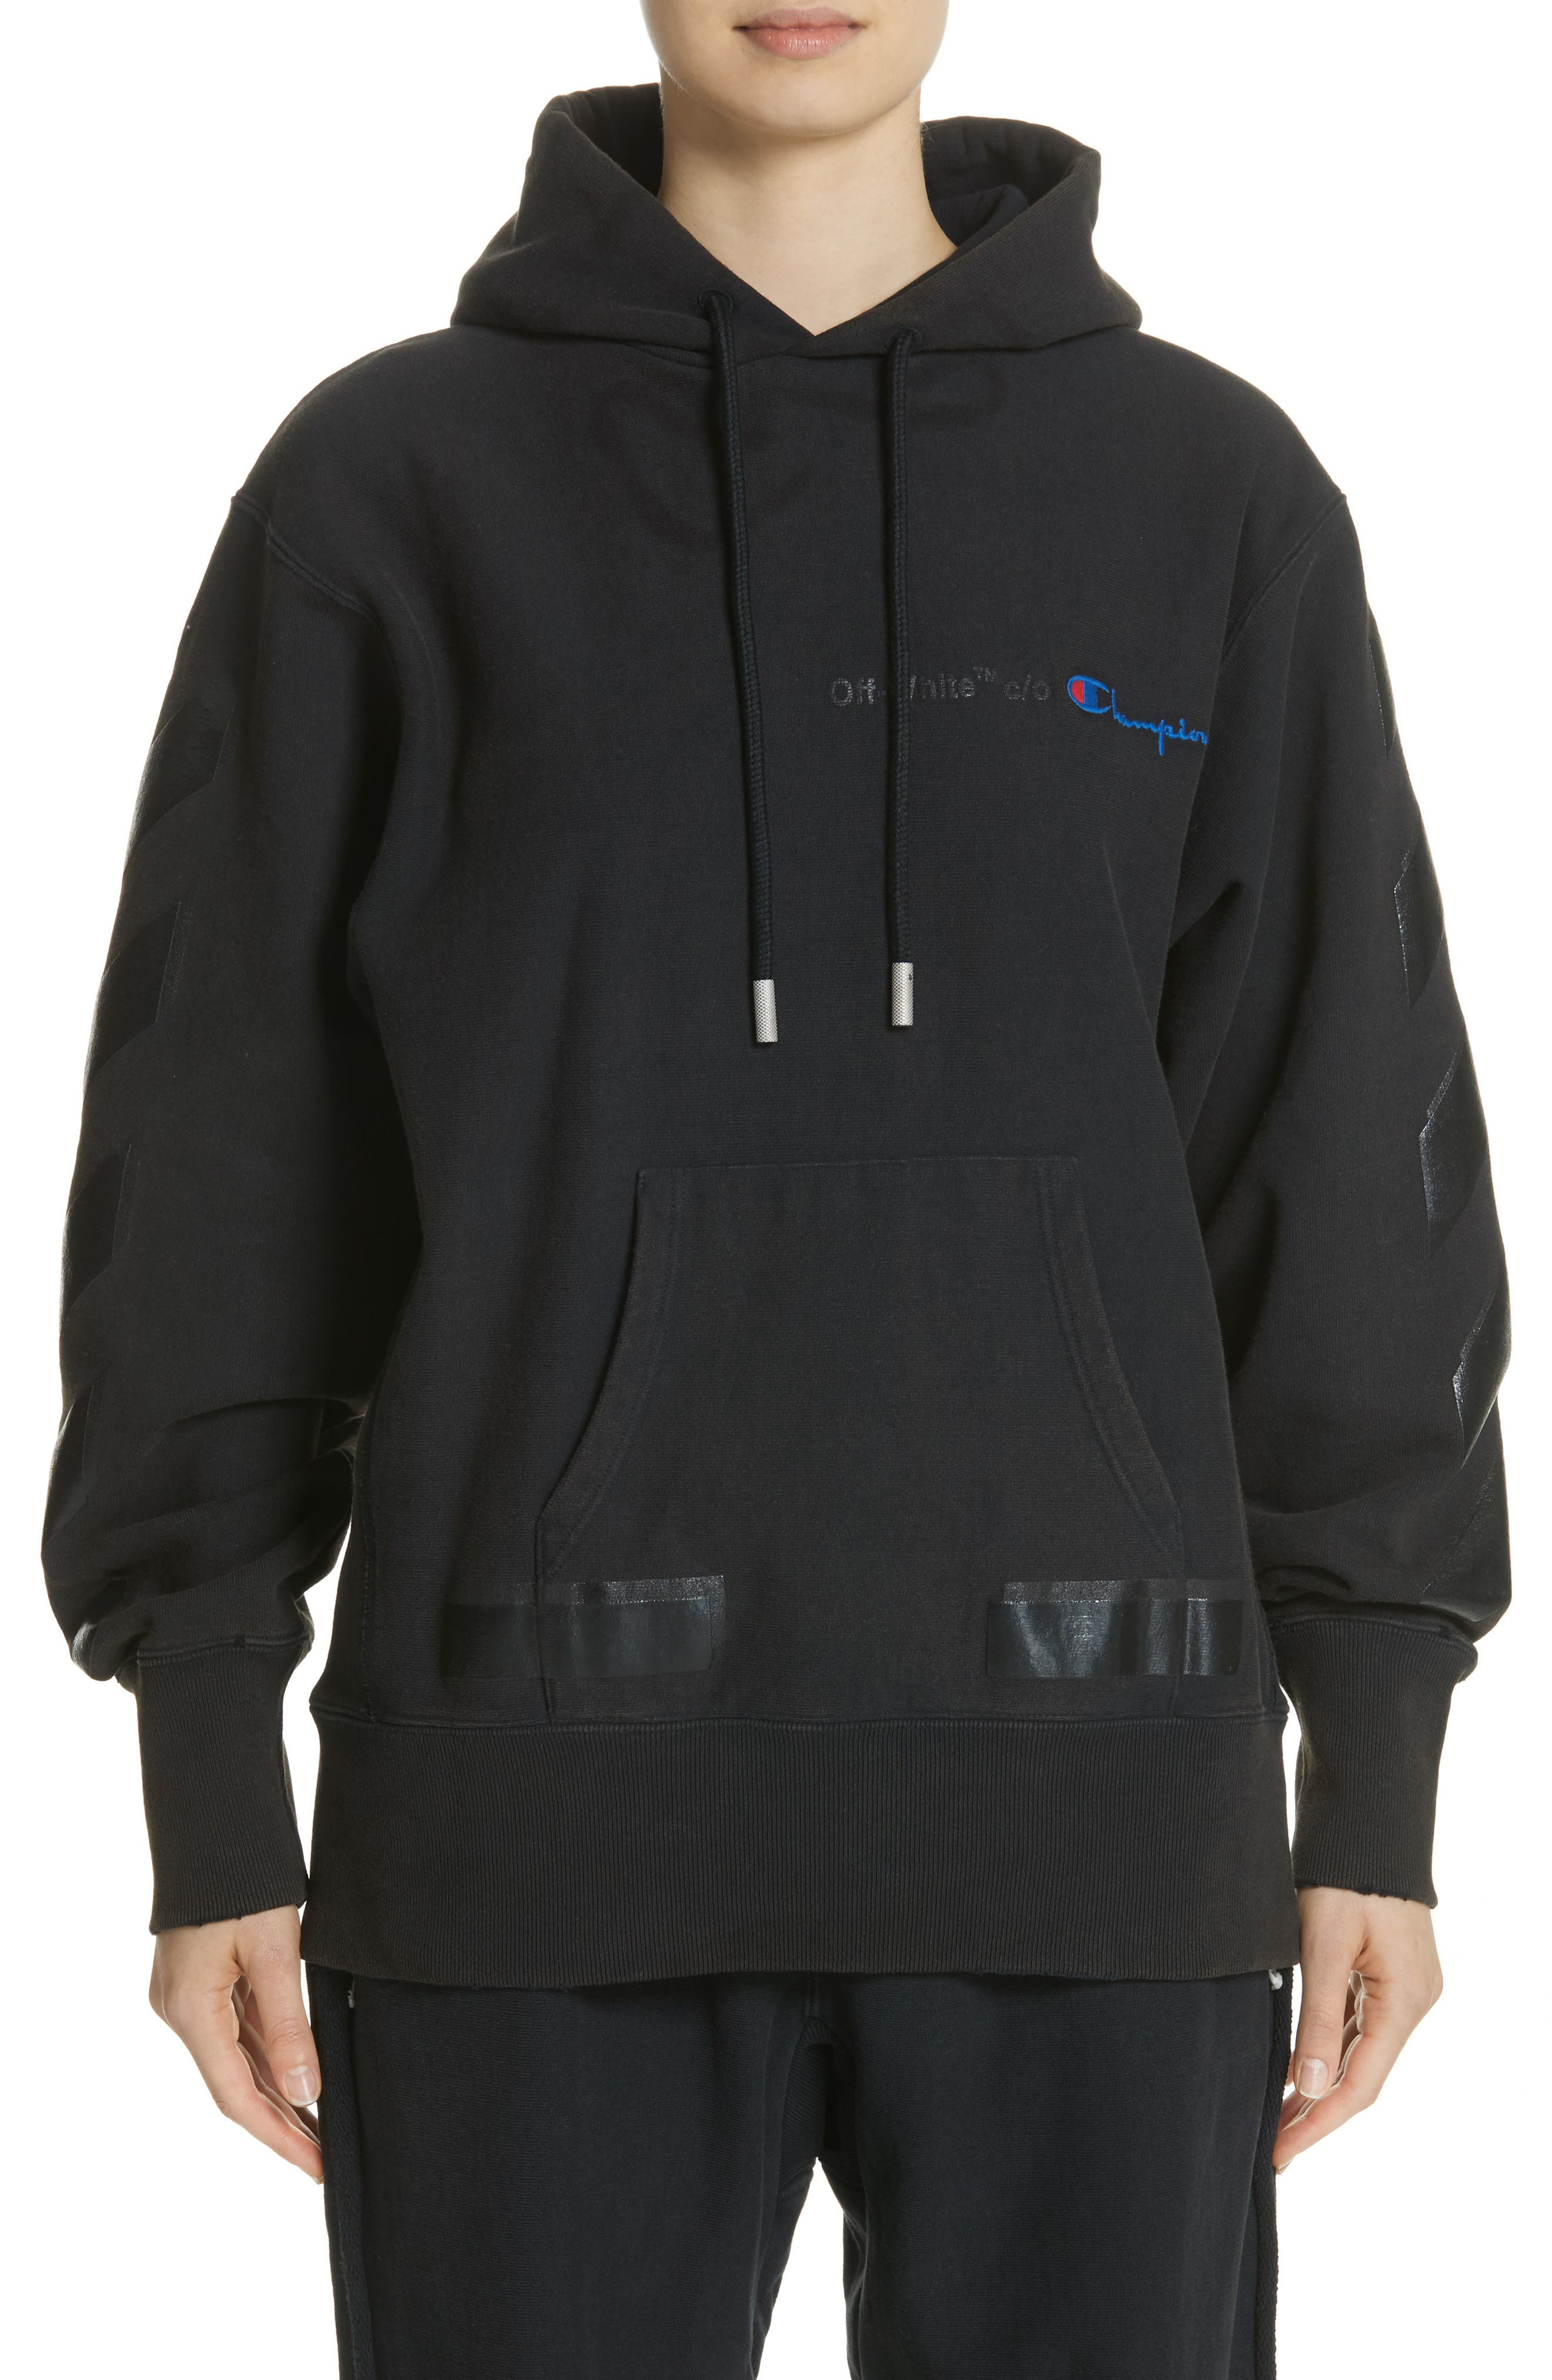 x Champion Pullover Hoodie,                         Main,                         color, Black/ Black